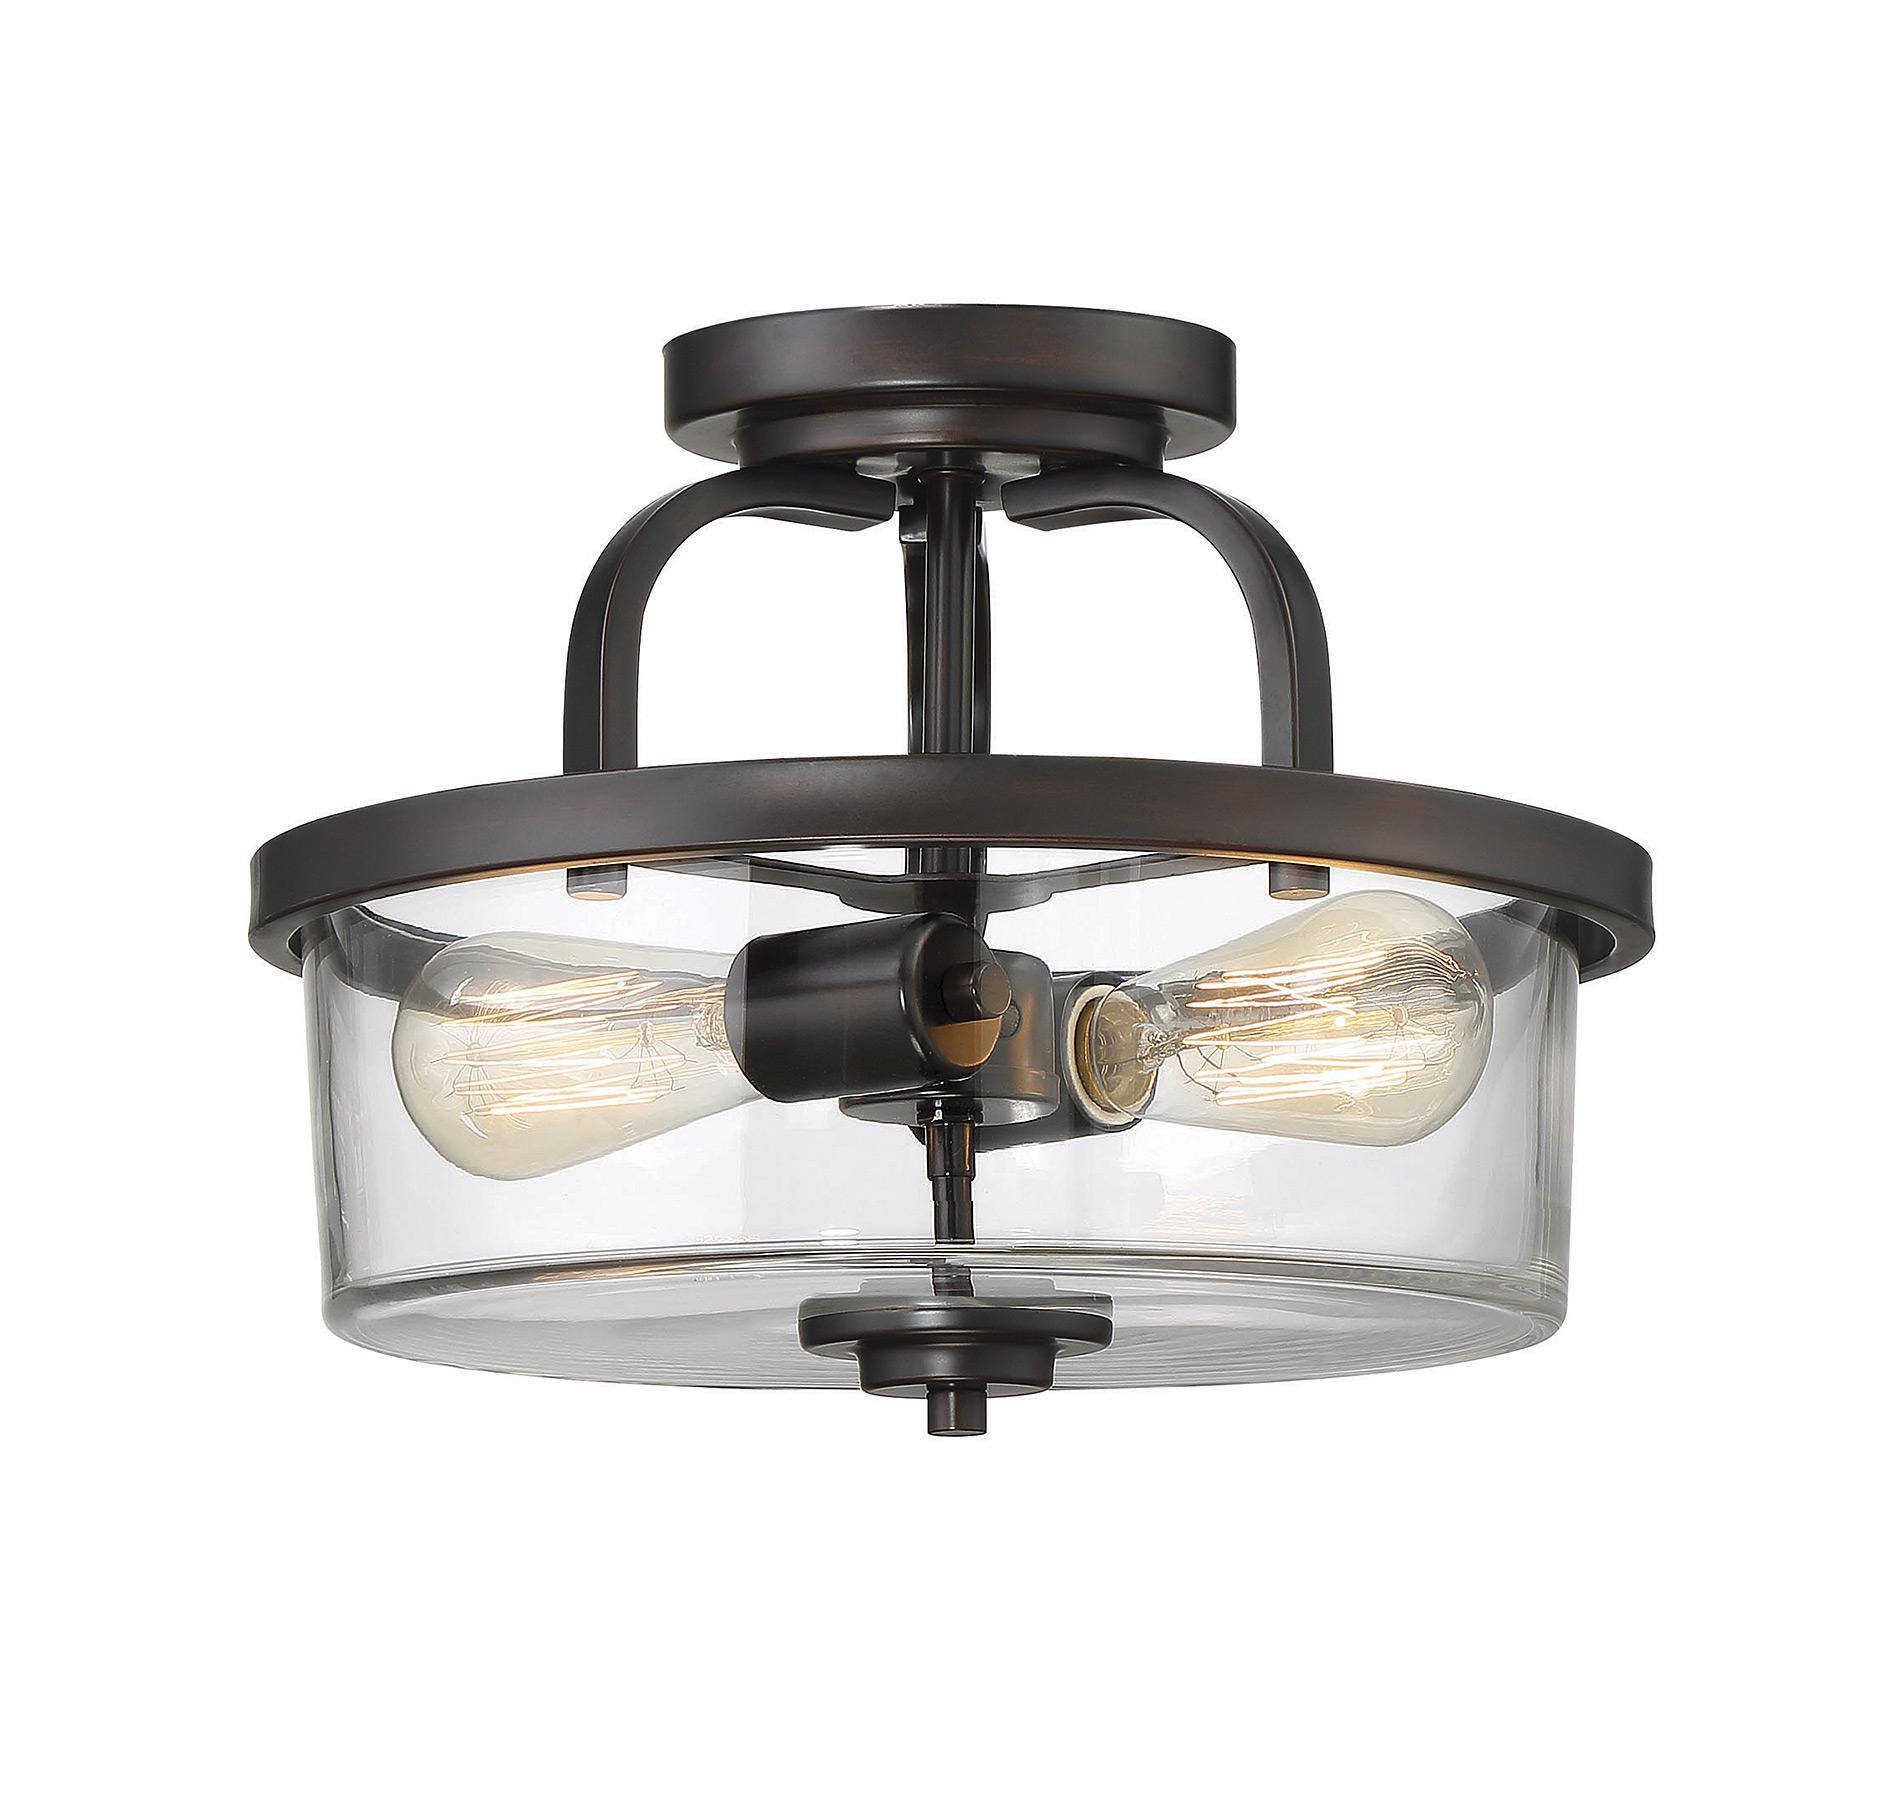 Tulsa Ceiling Semi Flush Light By Savoy House 6 6053 2 13